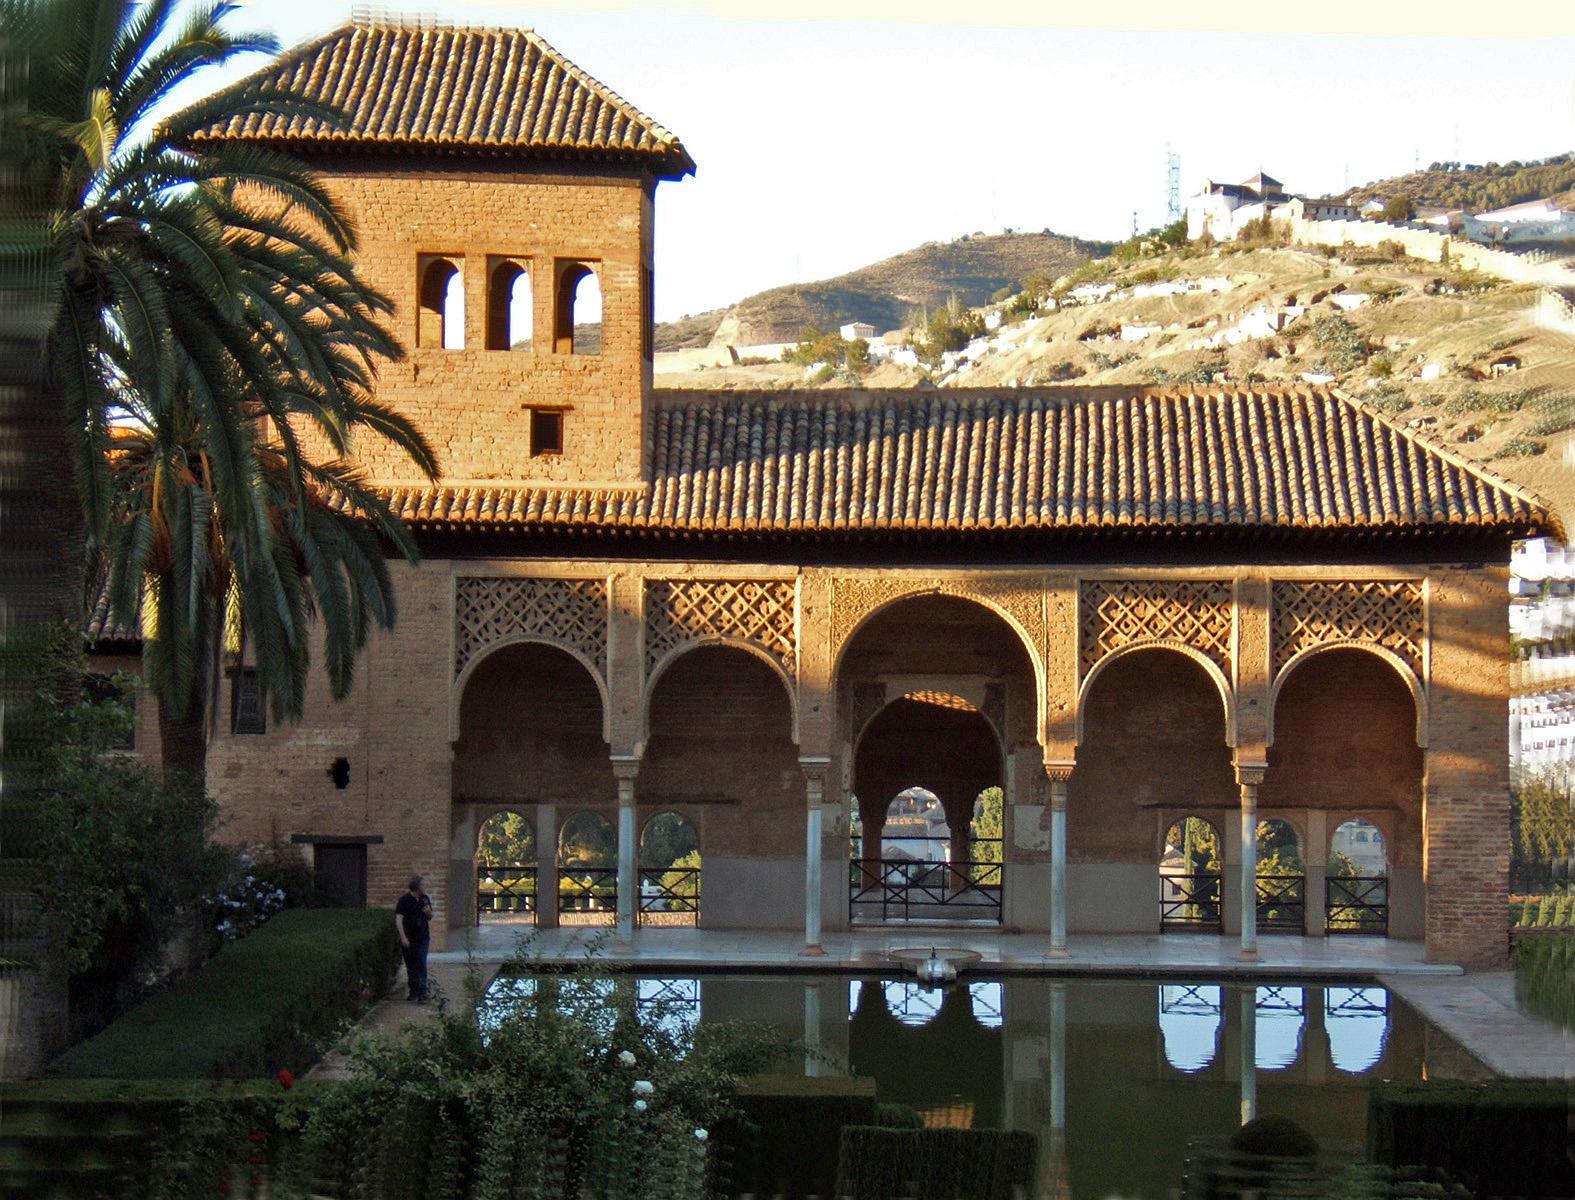 Fotografiando jardines del partal alhambra granada for Jardines alhambra